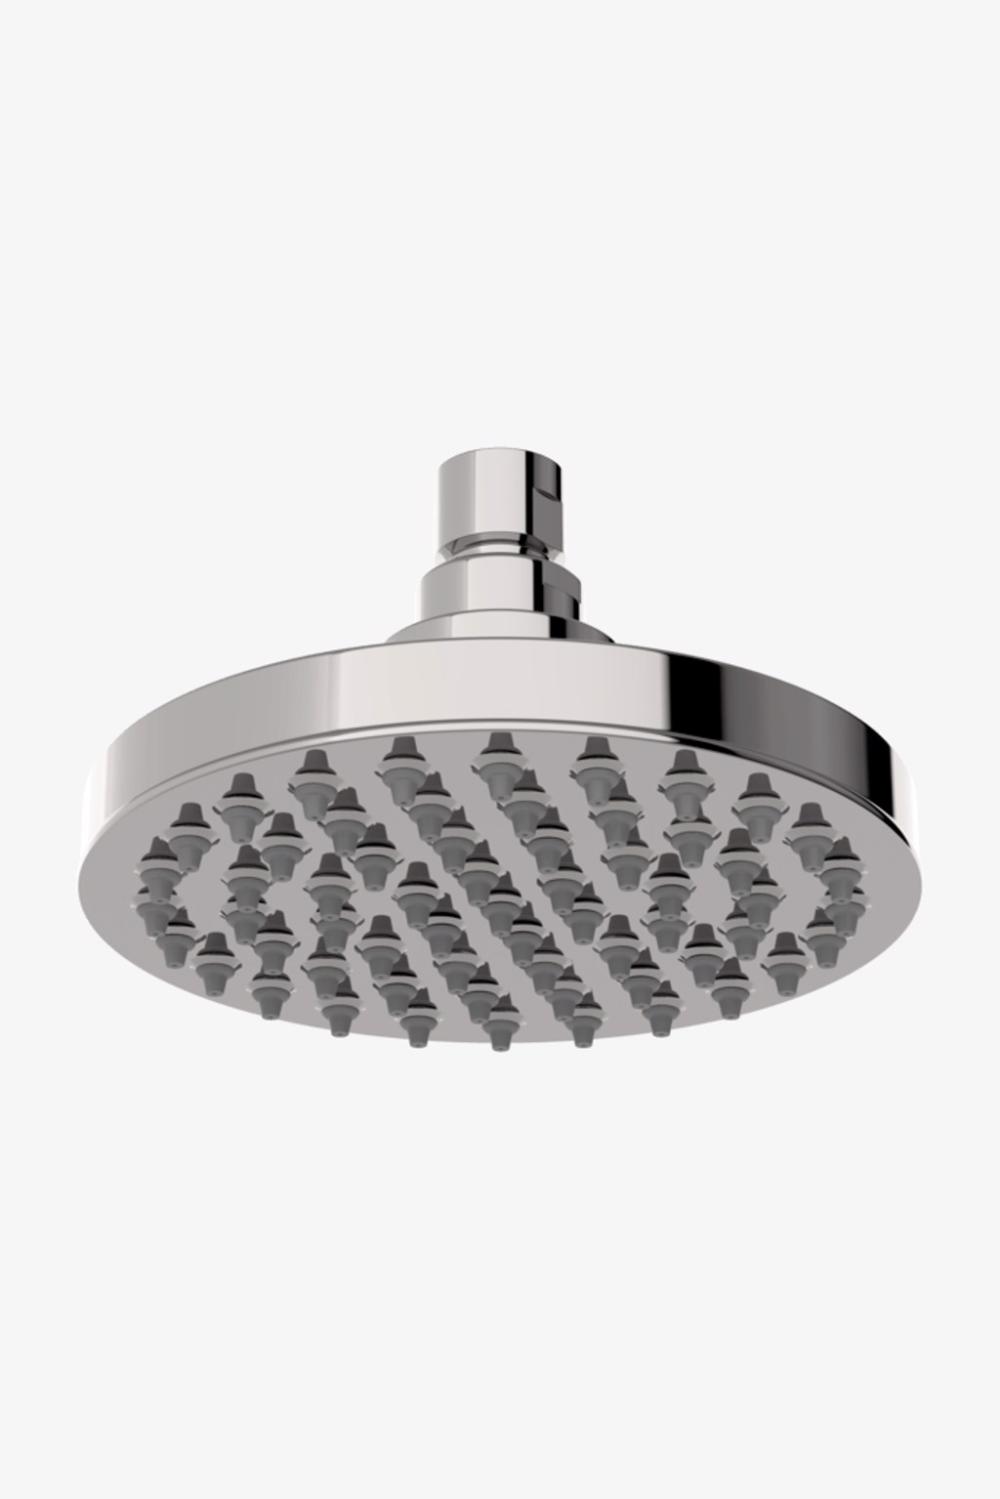 Universal 6 Rain Shower Head Rain Shower Head Shower Heads Rain Shower